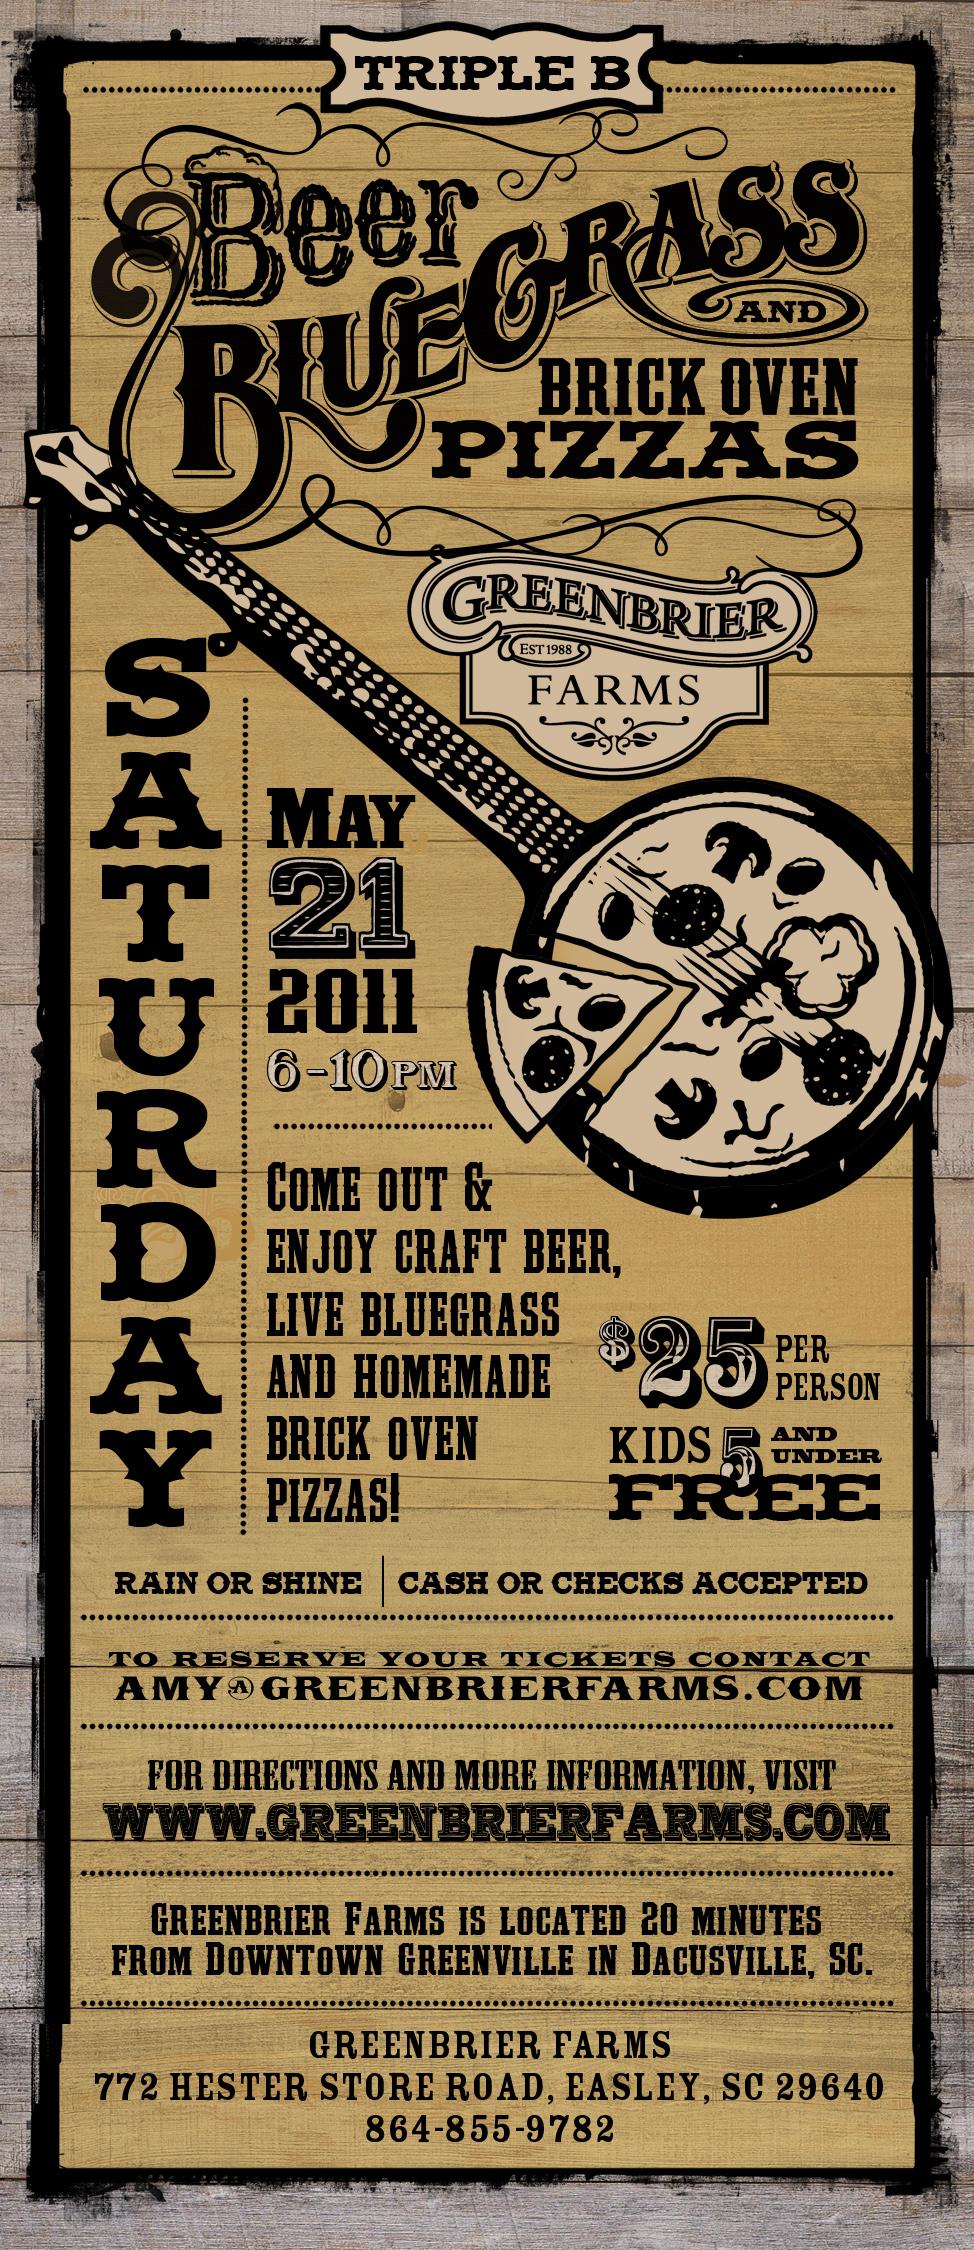 Greenbrier Farms Triple B 2011 Ad